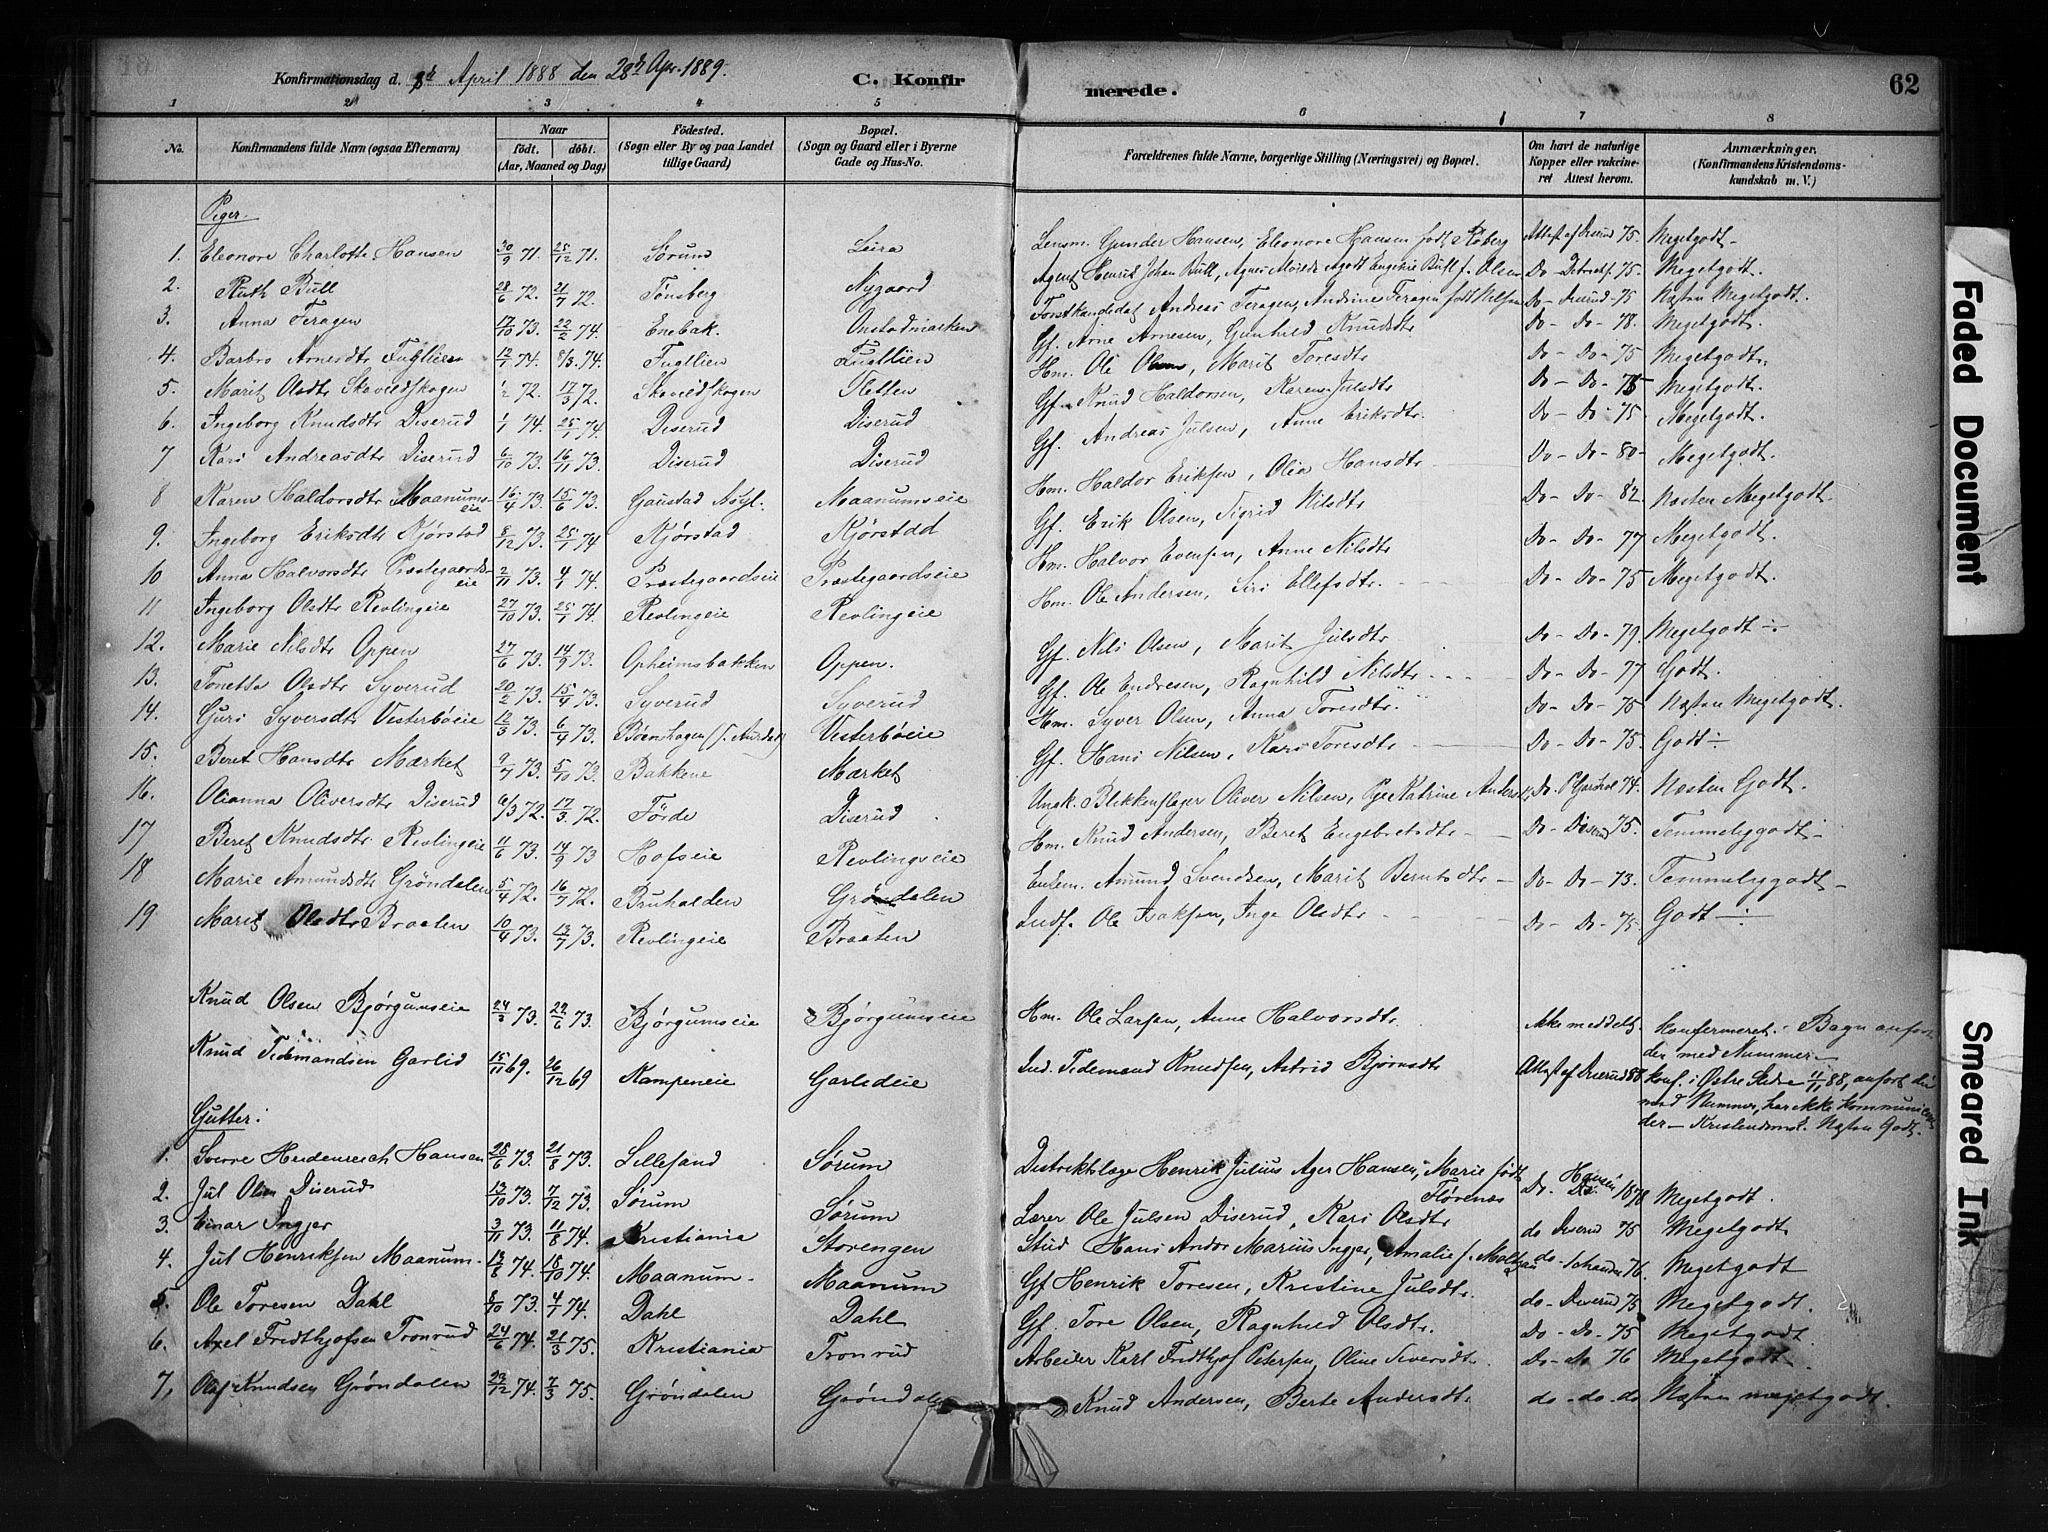 SAH, Nord-Aurdal prestekontor, Ministerialbok nr. 13, 1883-1895, s. 62